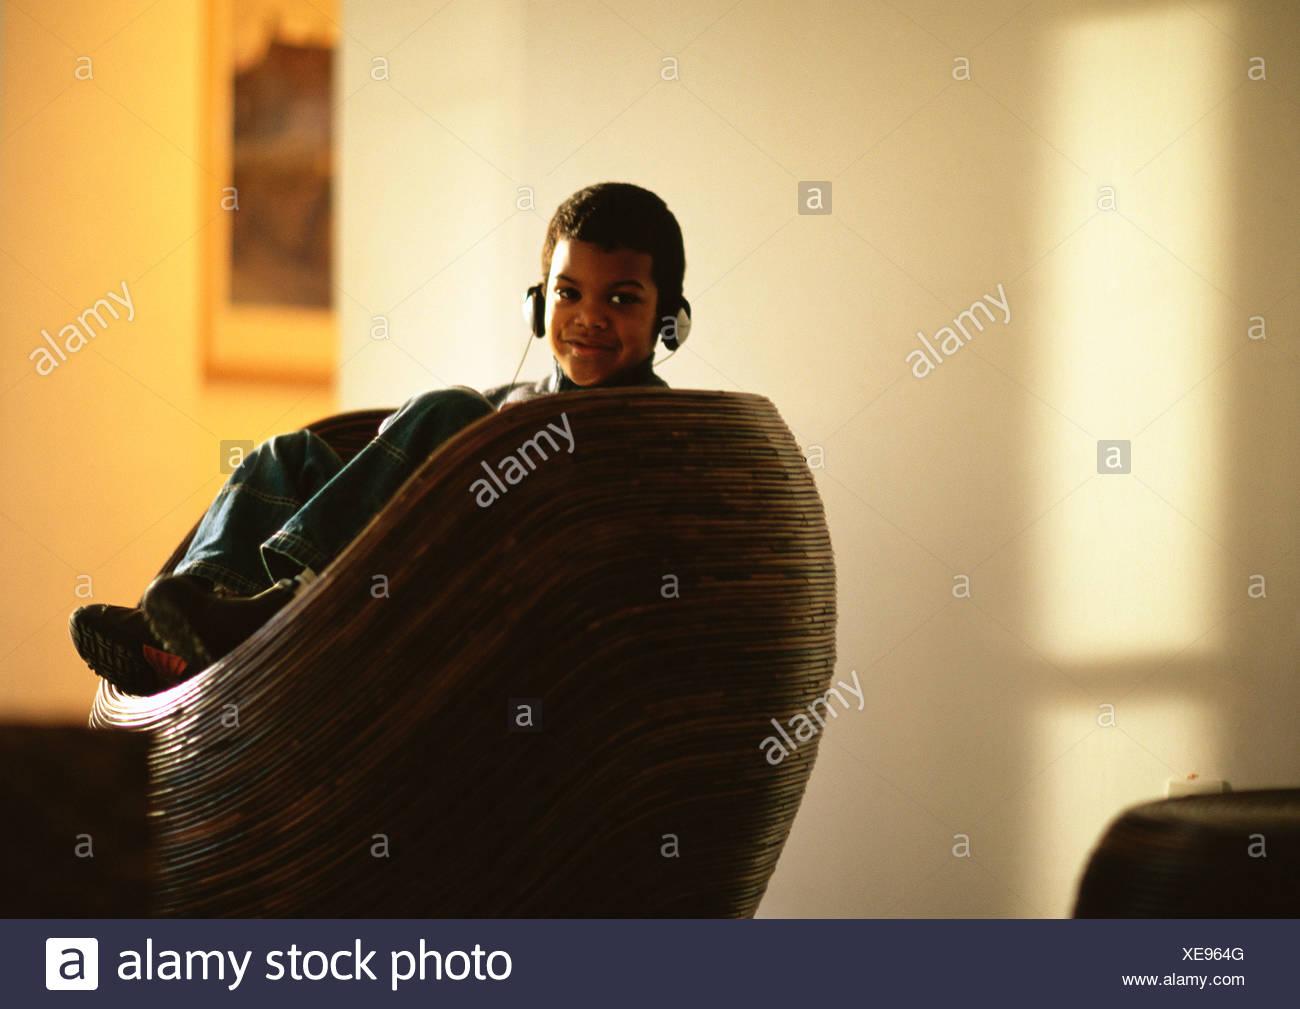 Kleiner Junge sitzt im Stuhl Musikhören mit Kopfhörer, Lächeln Stockbild